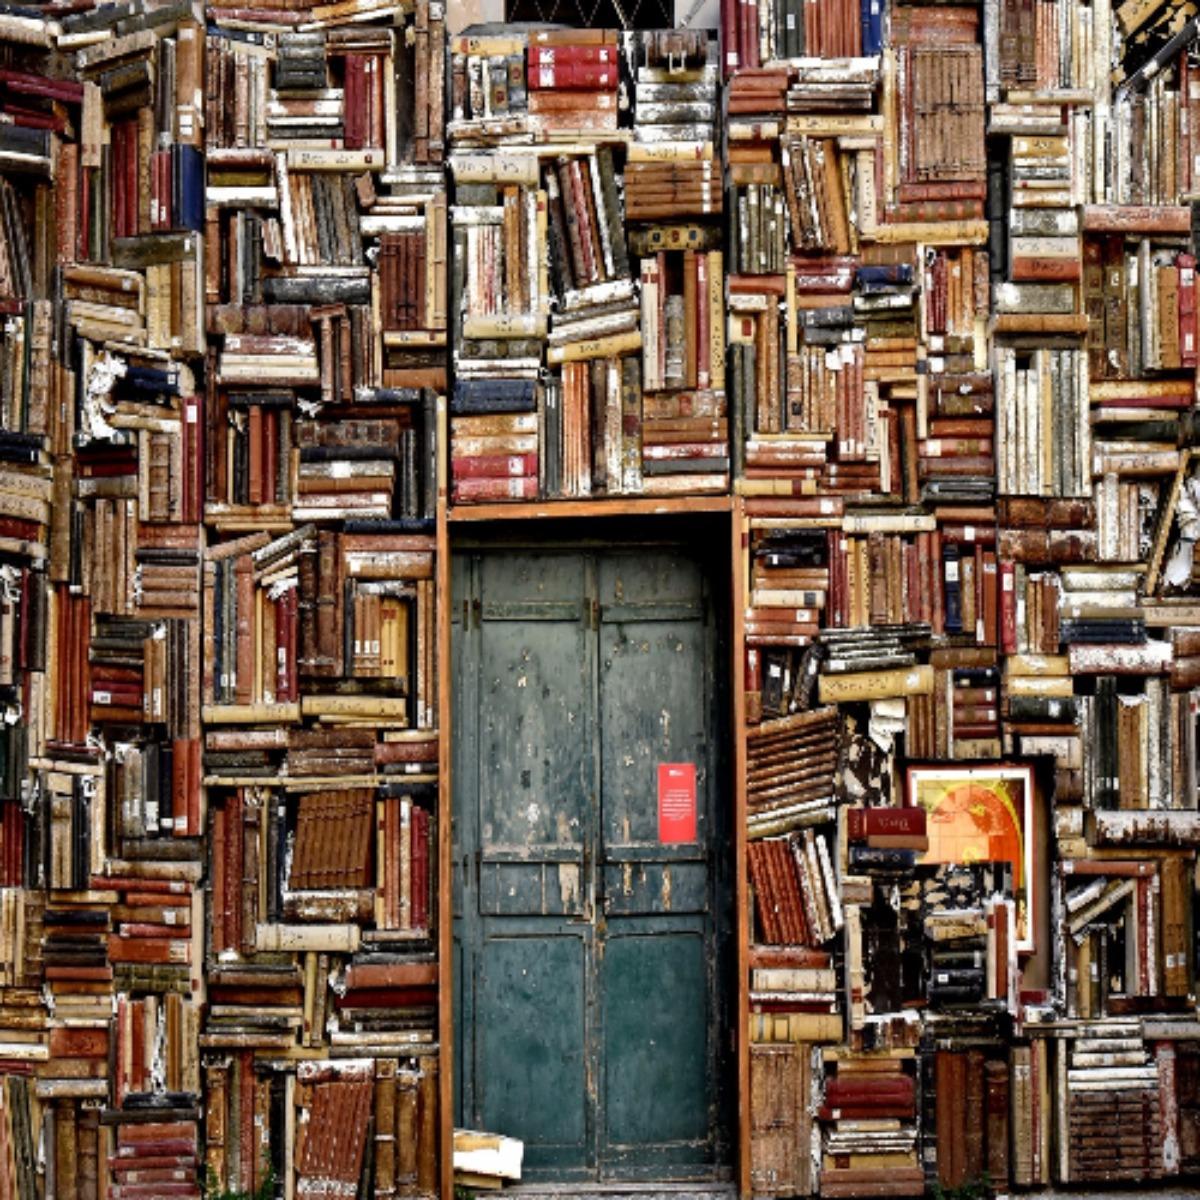 books-1655783_1920-sq.jpg